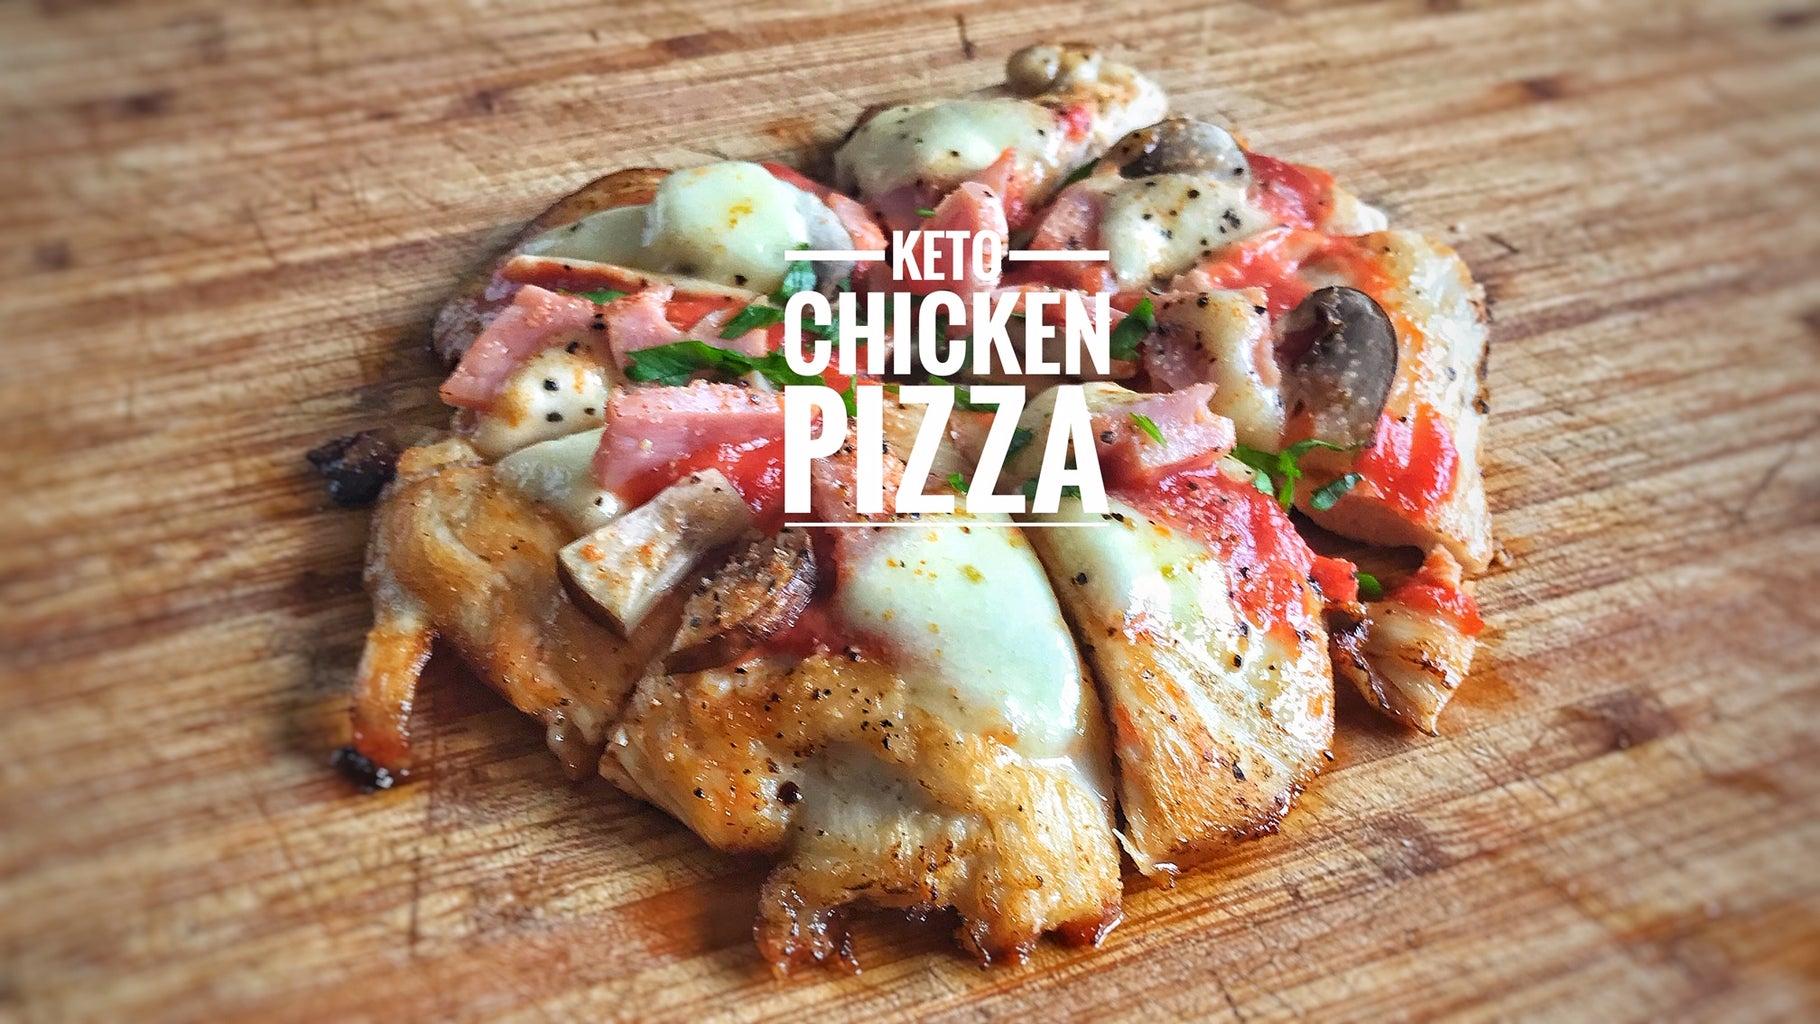 Keto - Chicken Pizza Crust